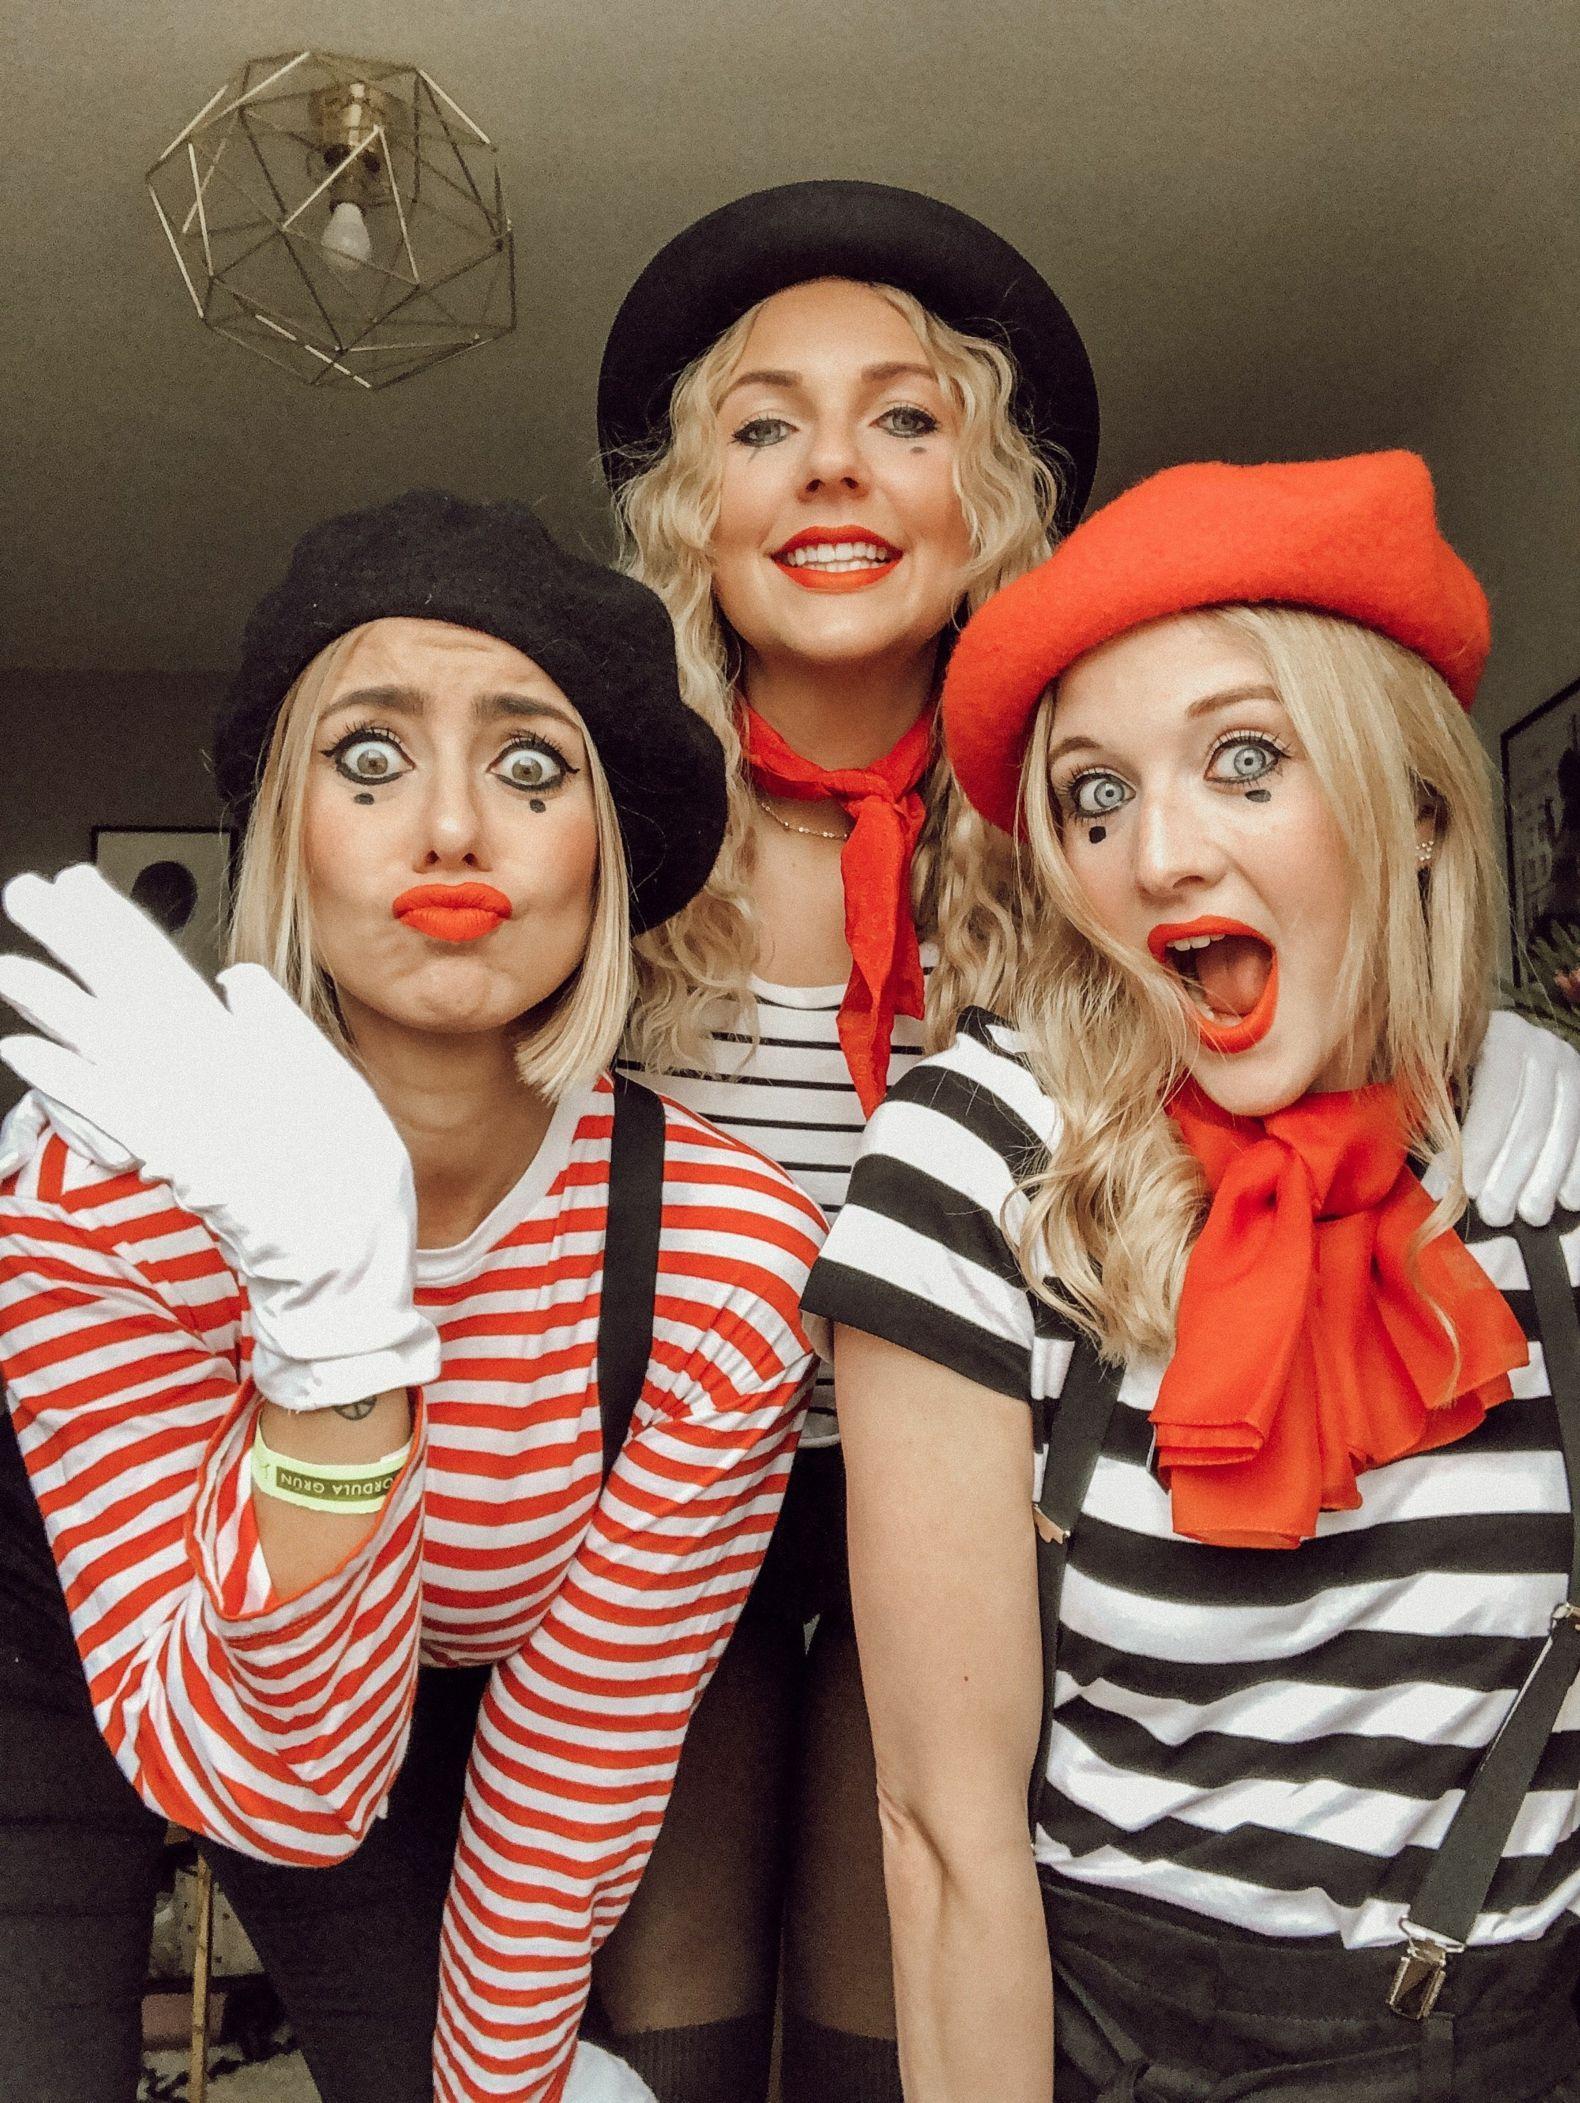 Women Costume Ideas Circus halloween trends costumes